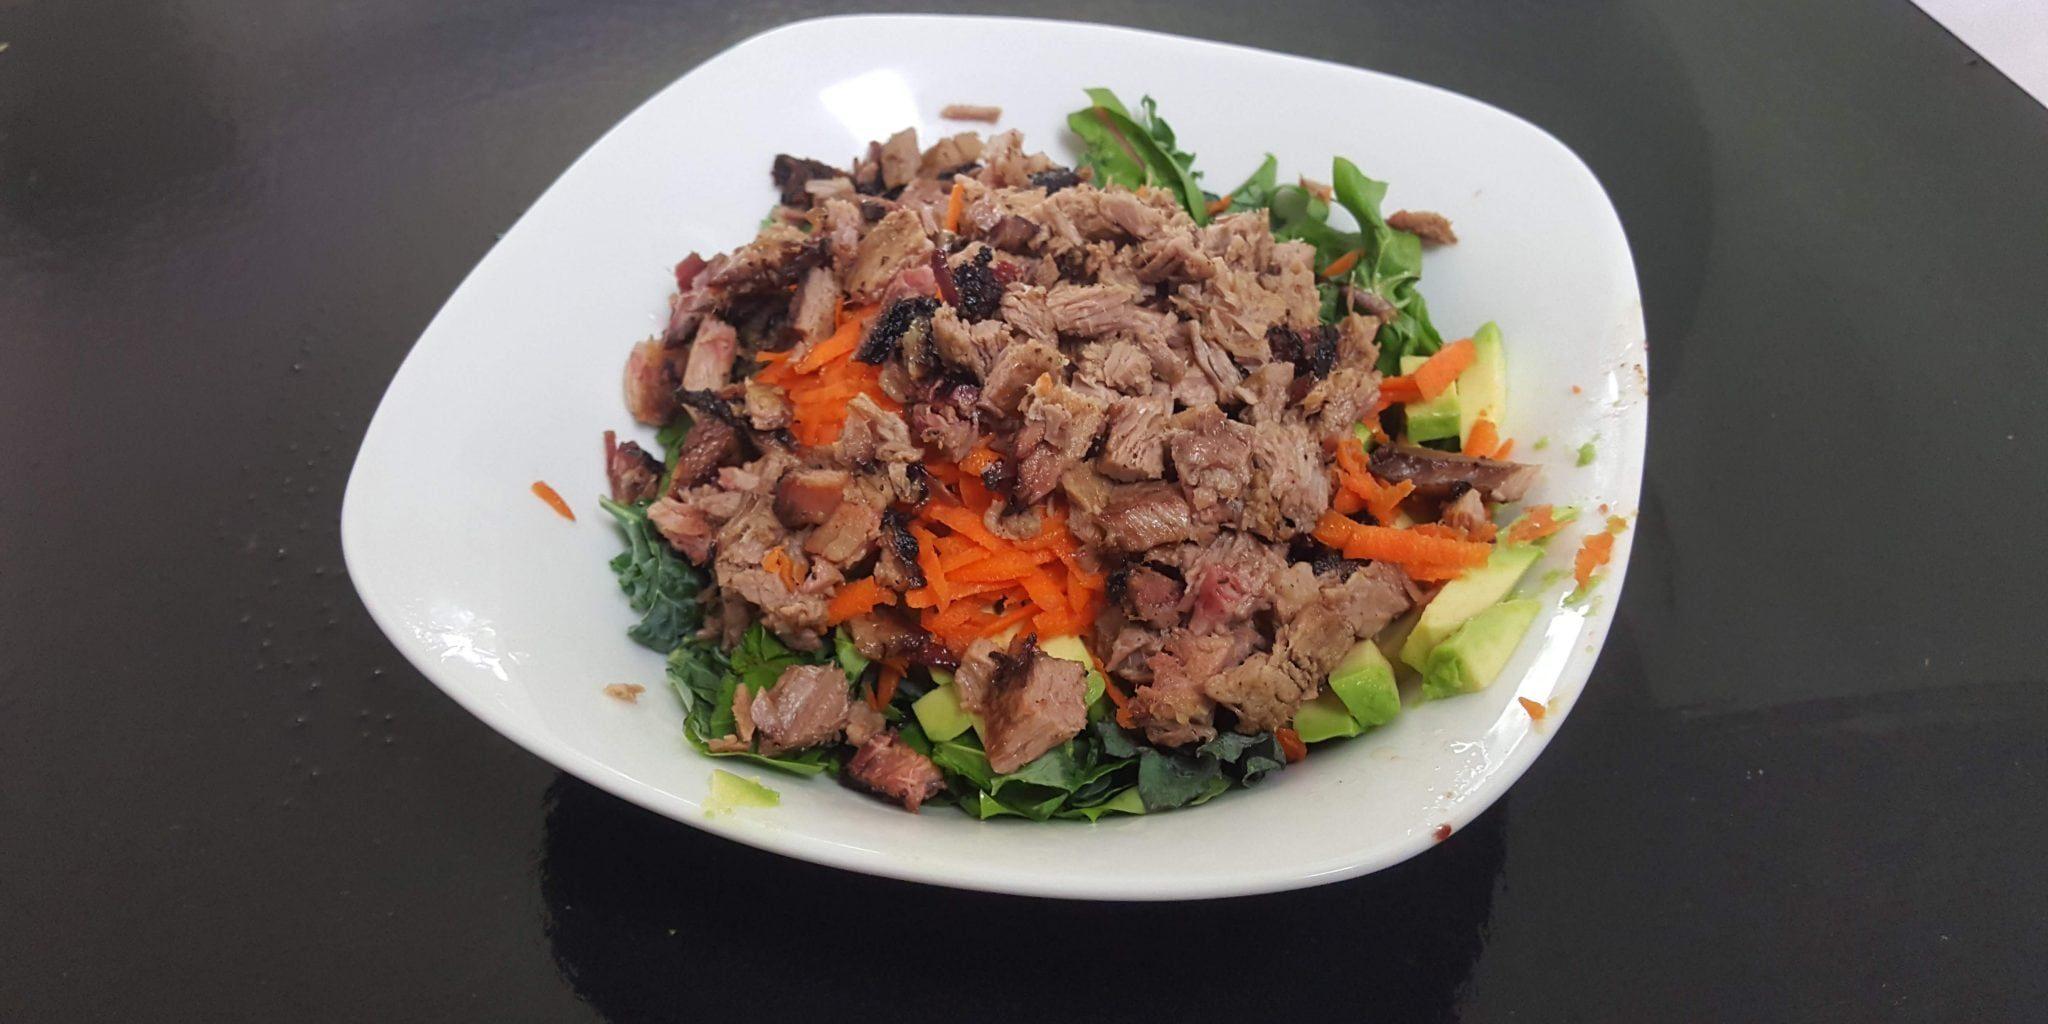 Brisket Salad